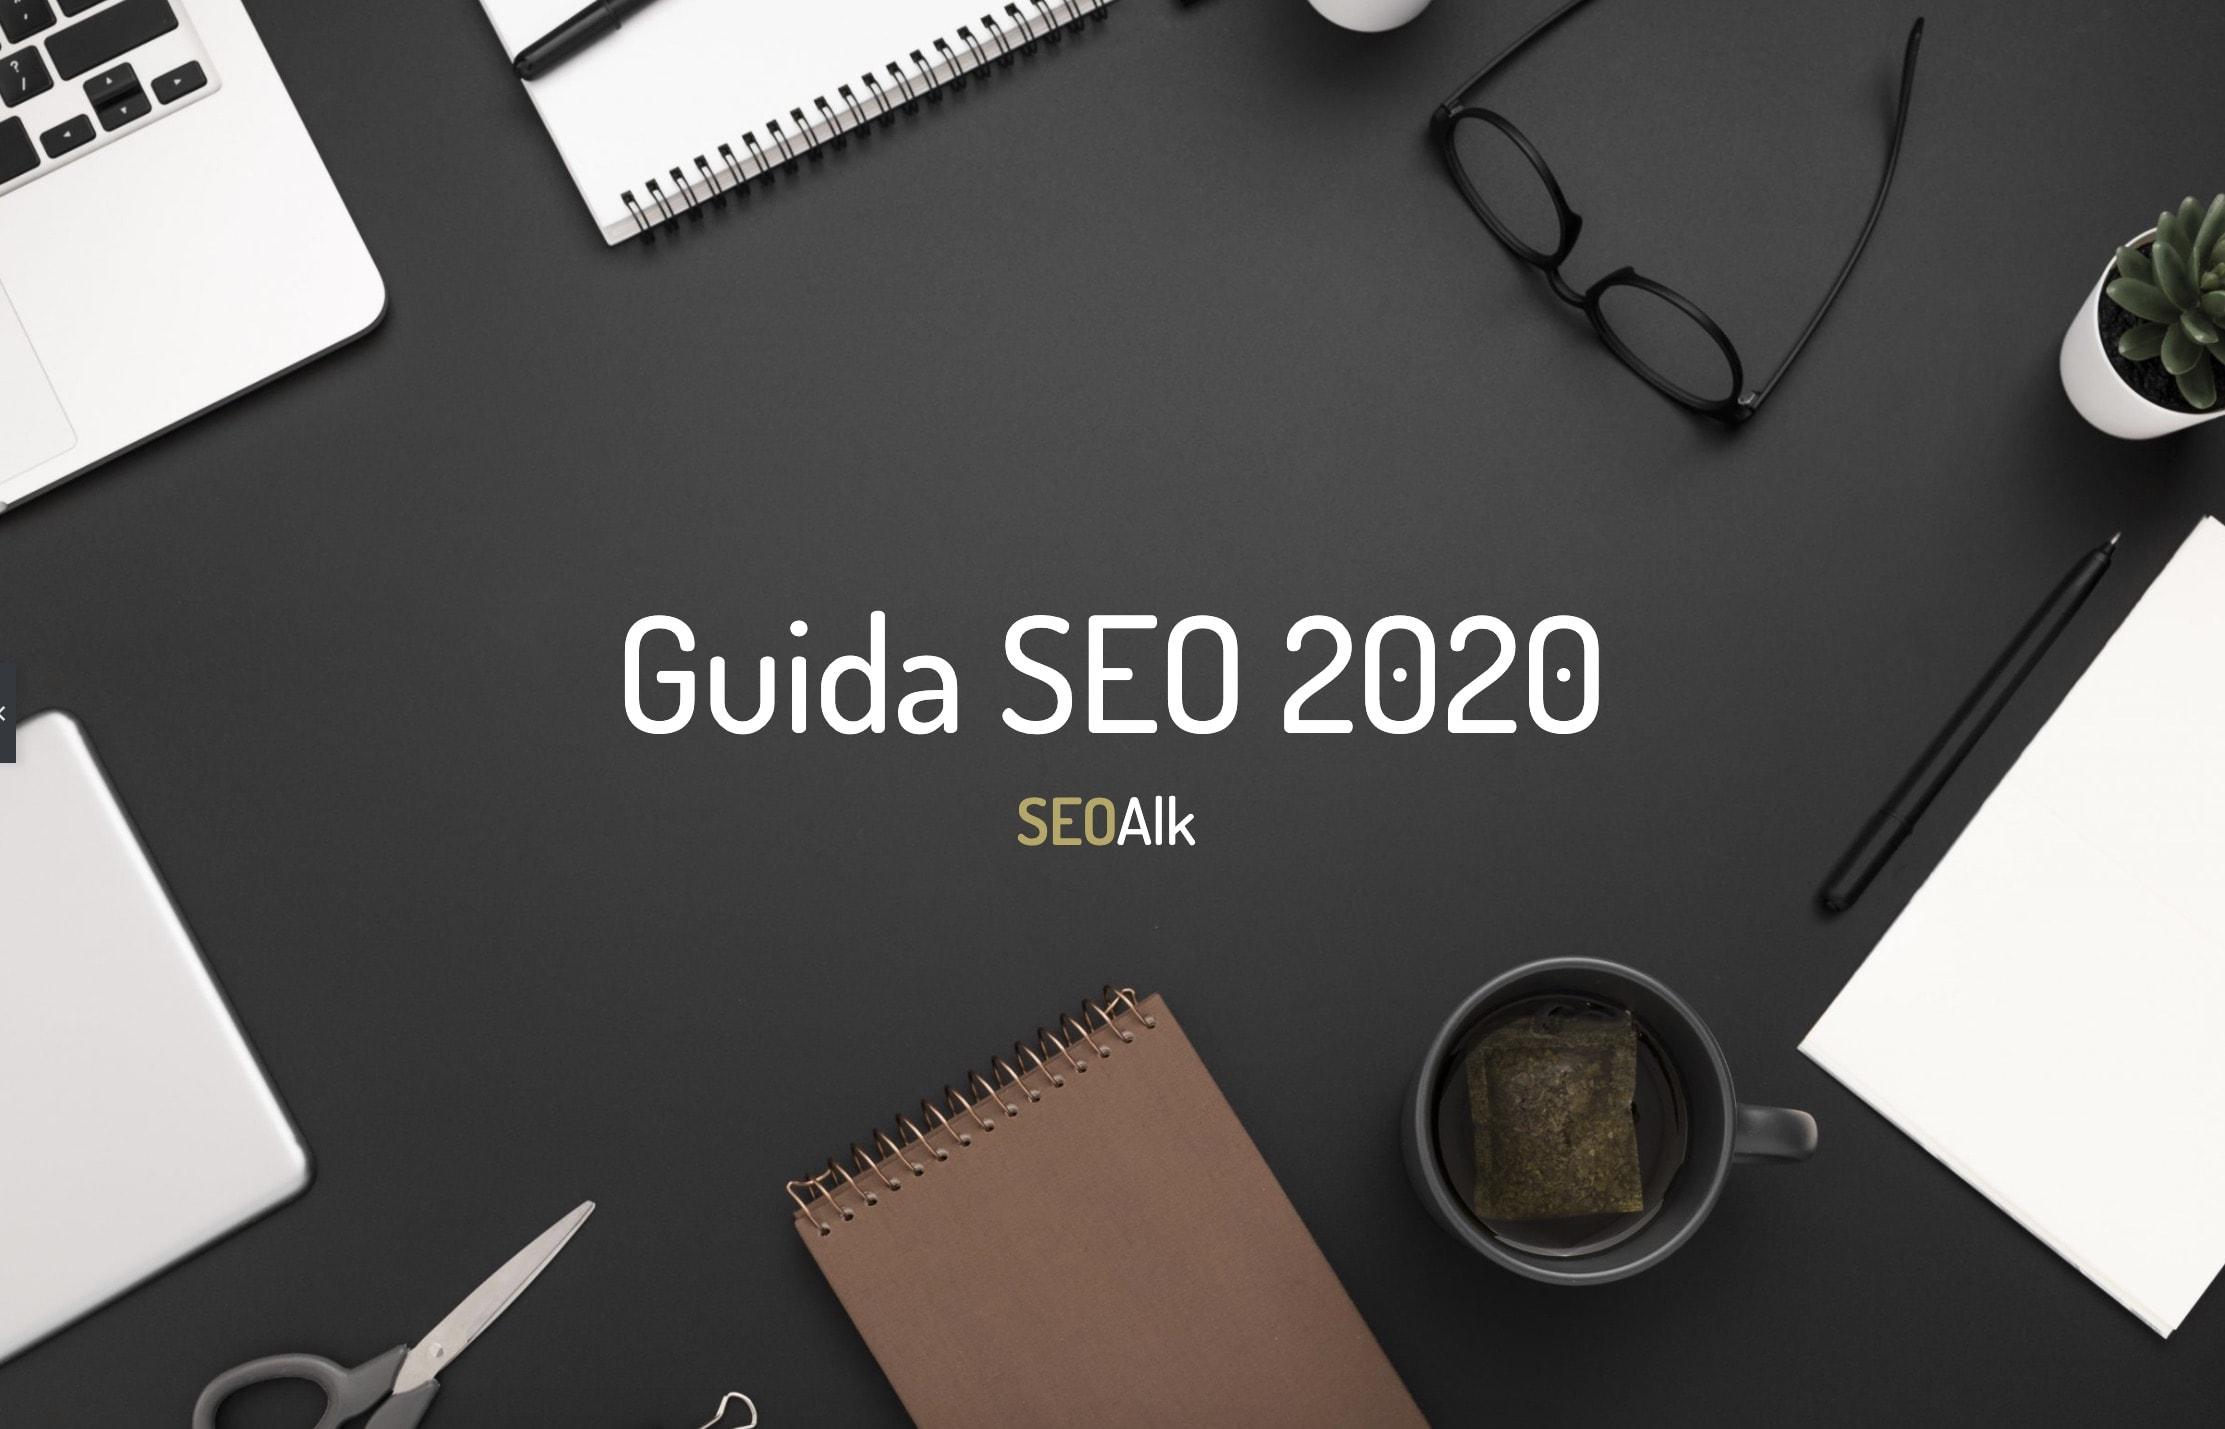 Guida SEO 2020 SEOAlk